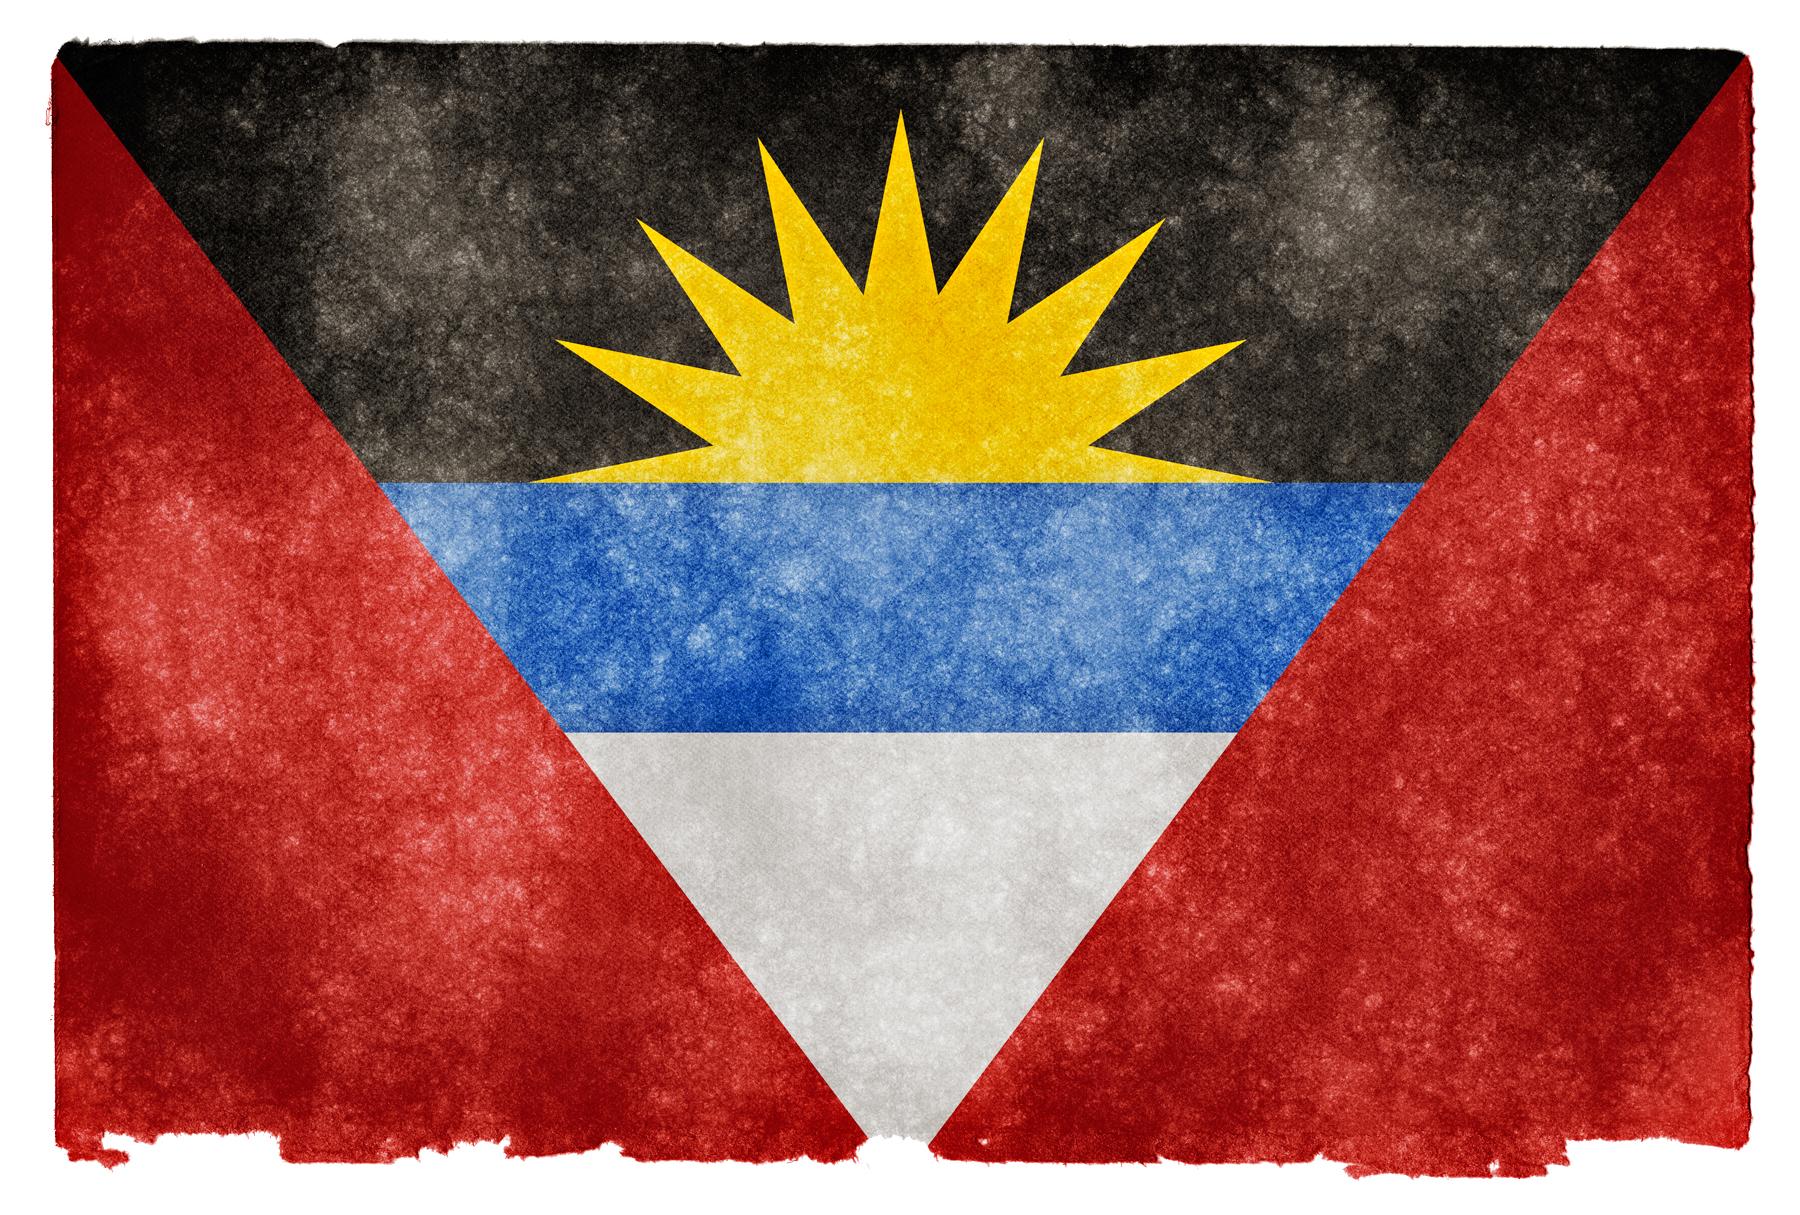 Antigua and Barbuda Grunge Flag, Aged, Resource, National, Old, HQ Photo